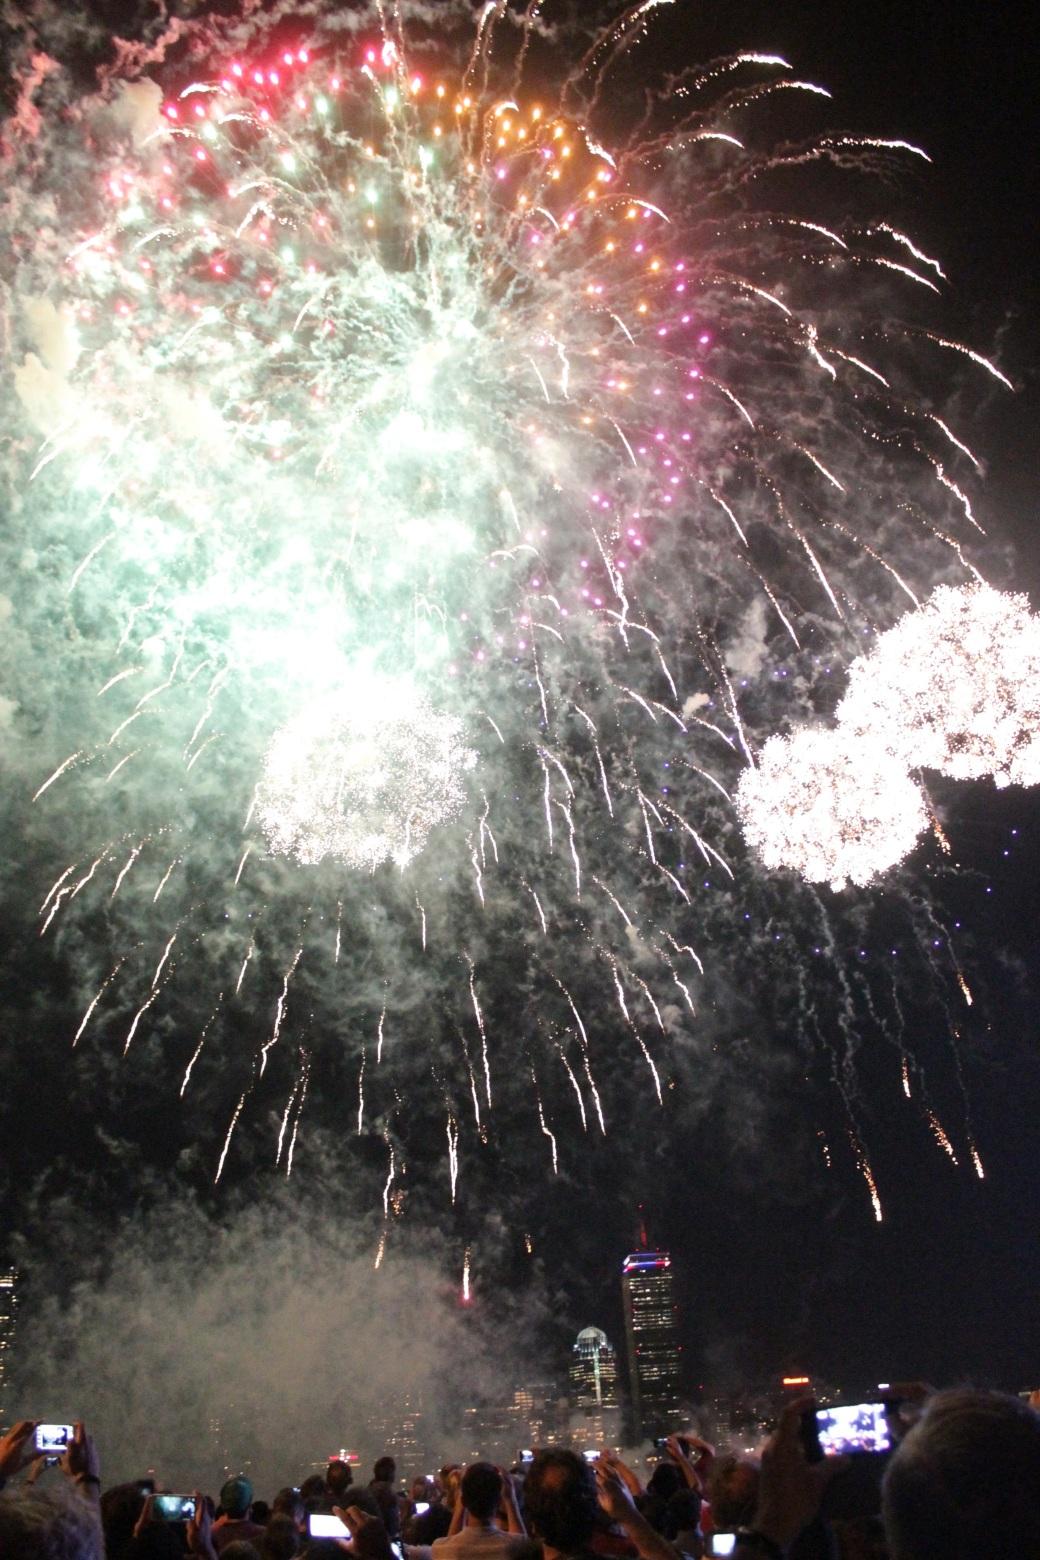 boston july 4 2013 fireworks 1